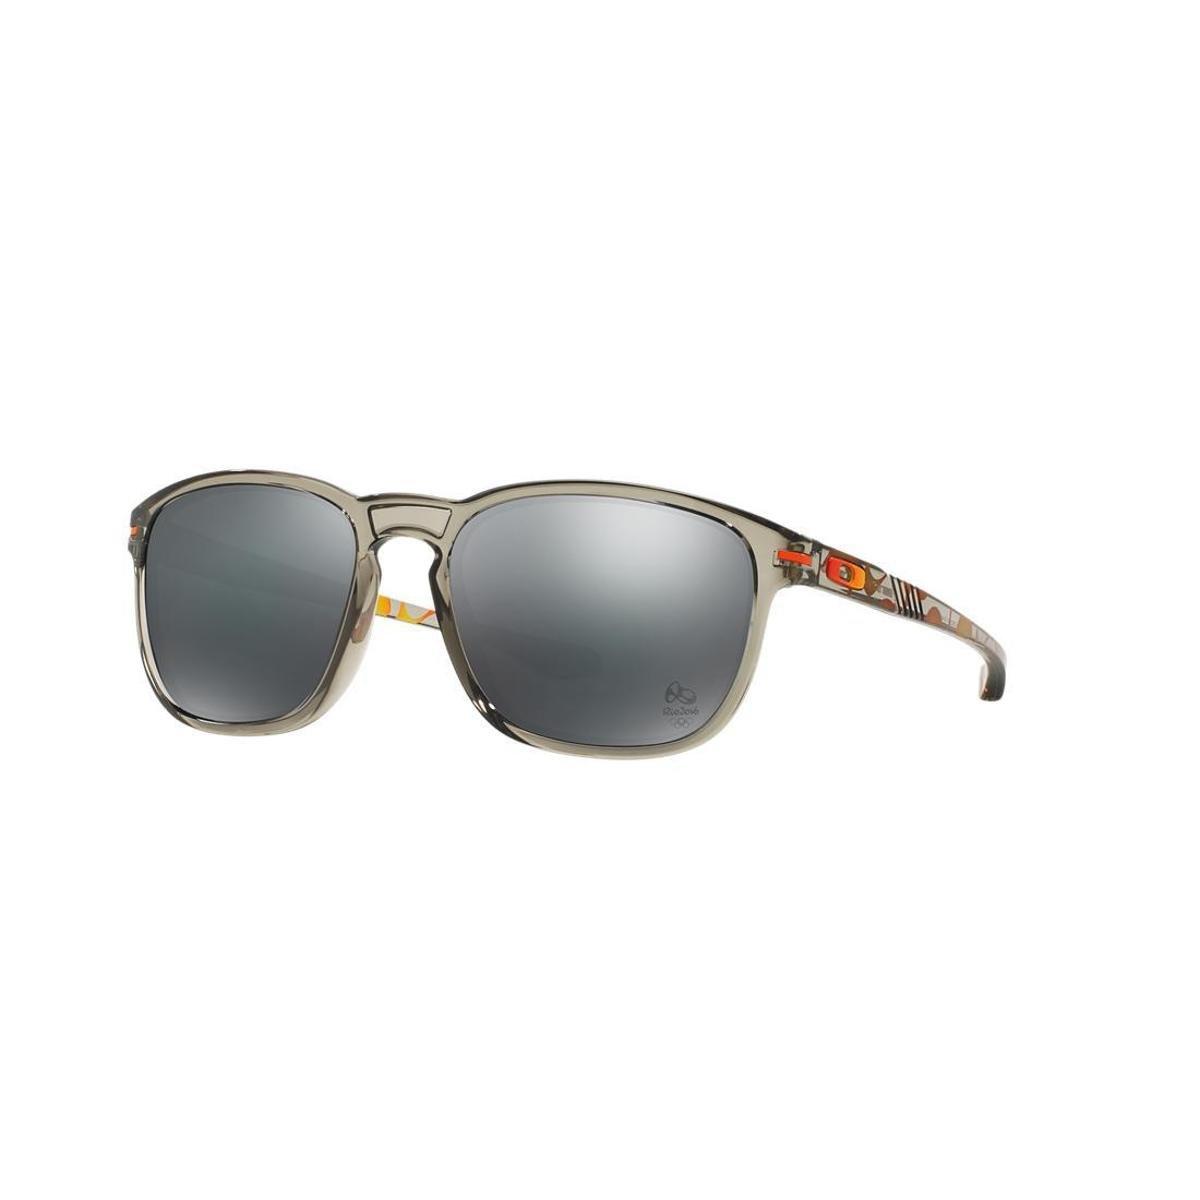 Óculos de Sol Oakley OO9223 Enduro - Compre Agora   Zattini 66c68faa75